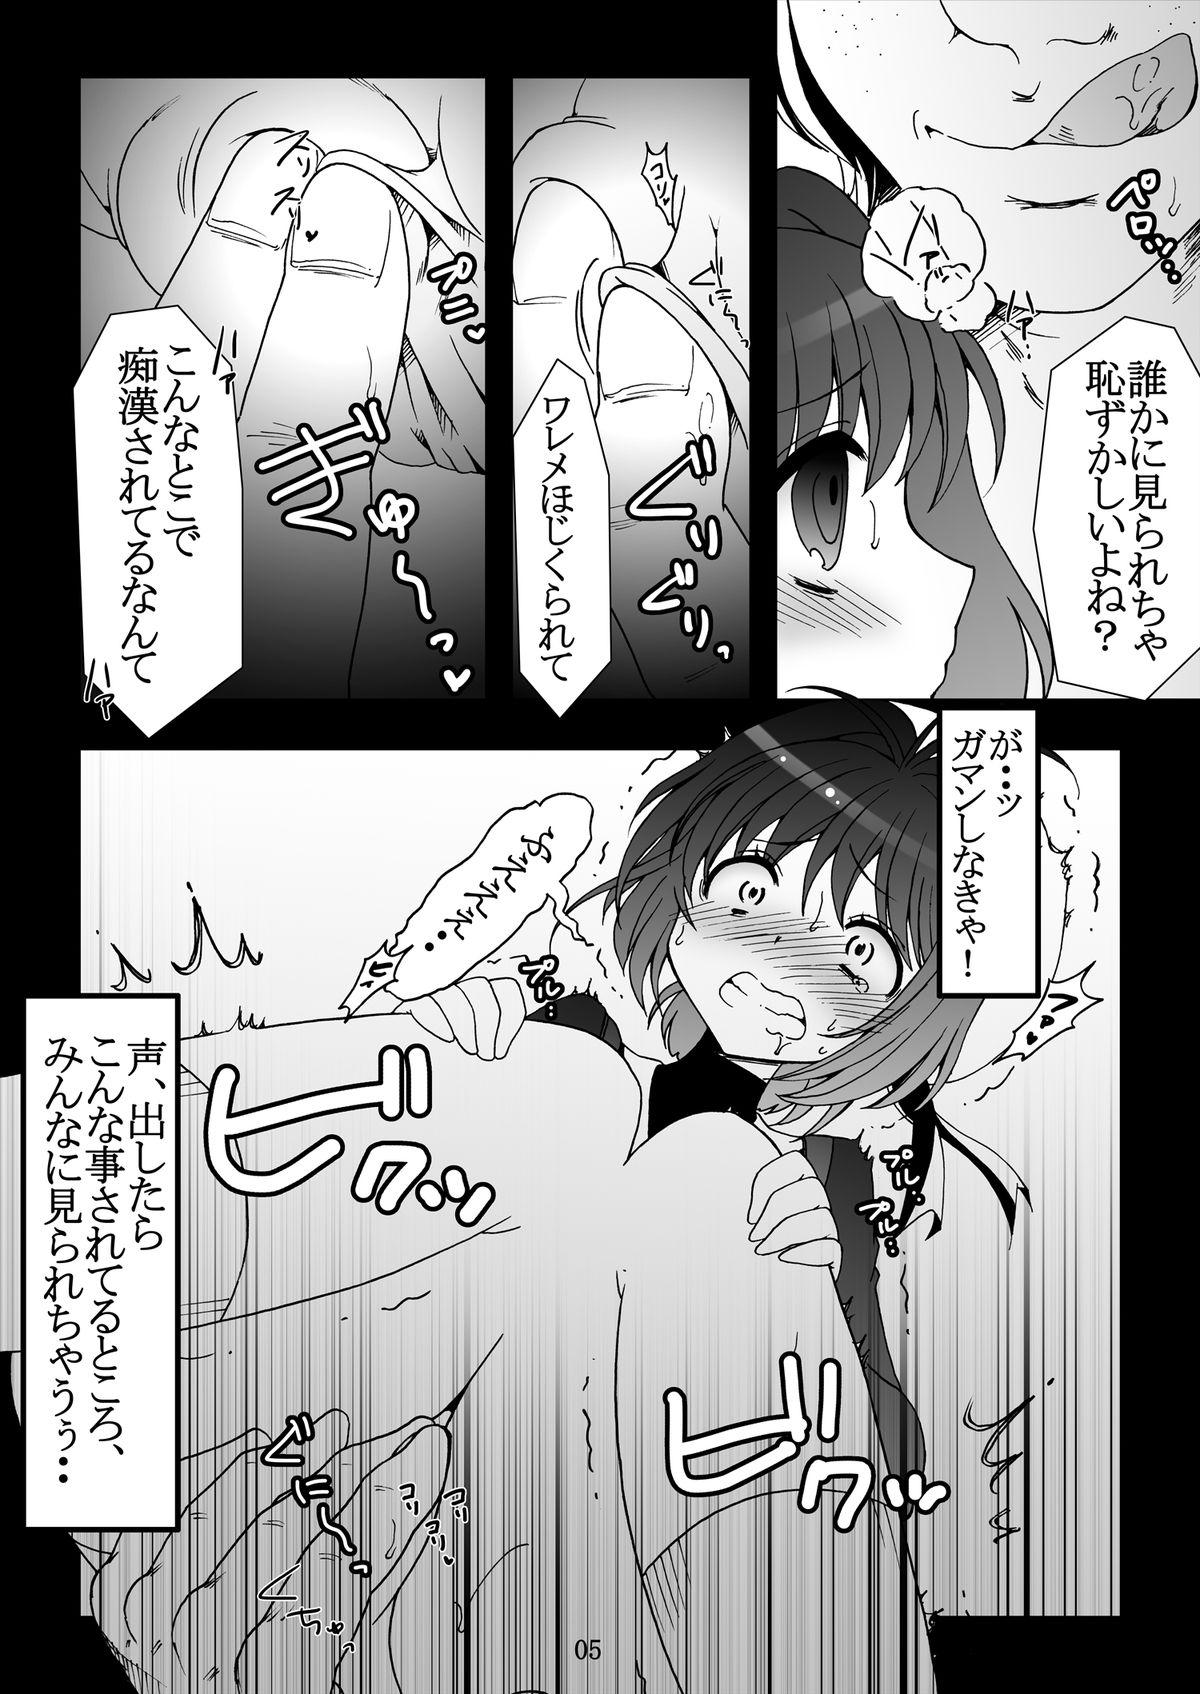 Sakura Slave to the Grind 4